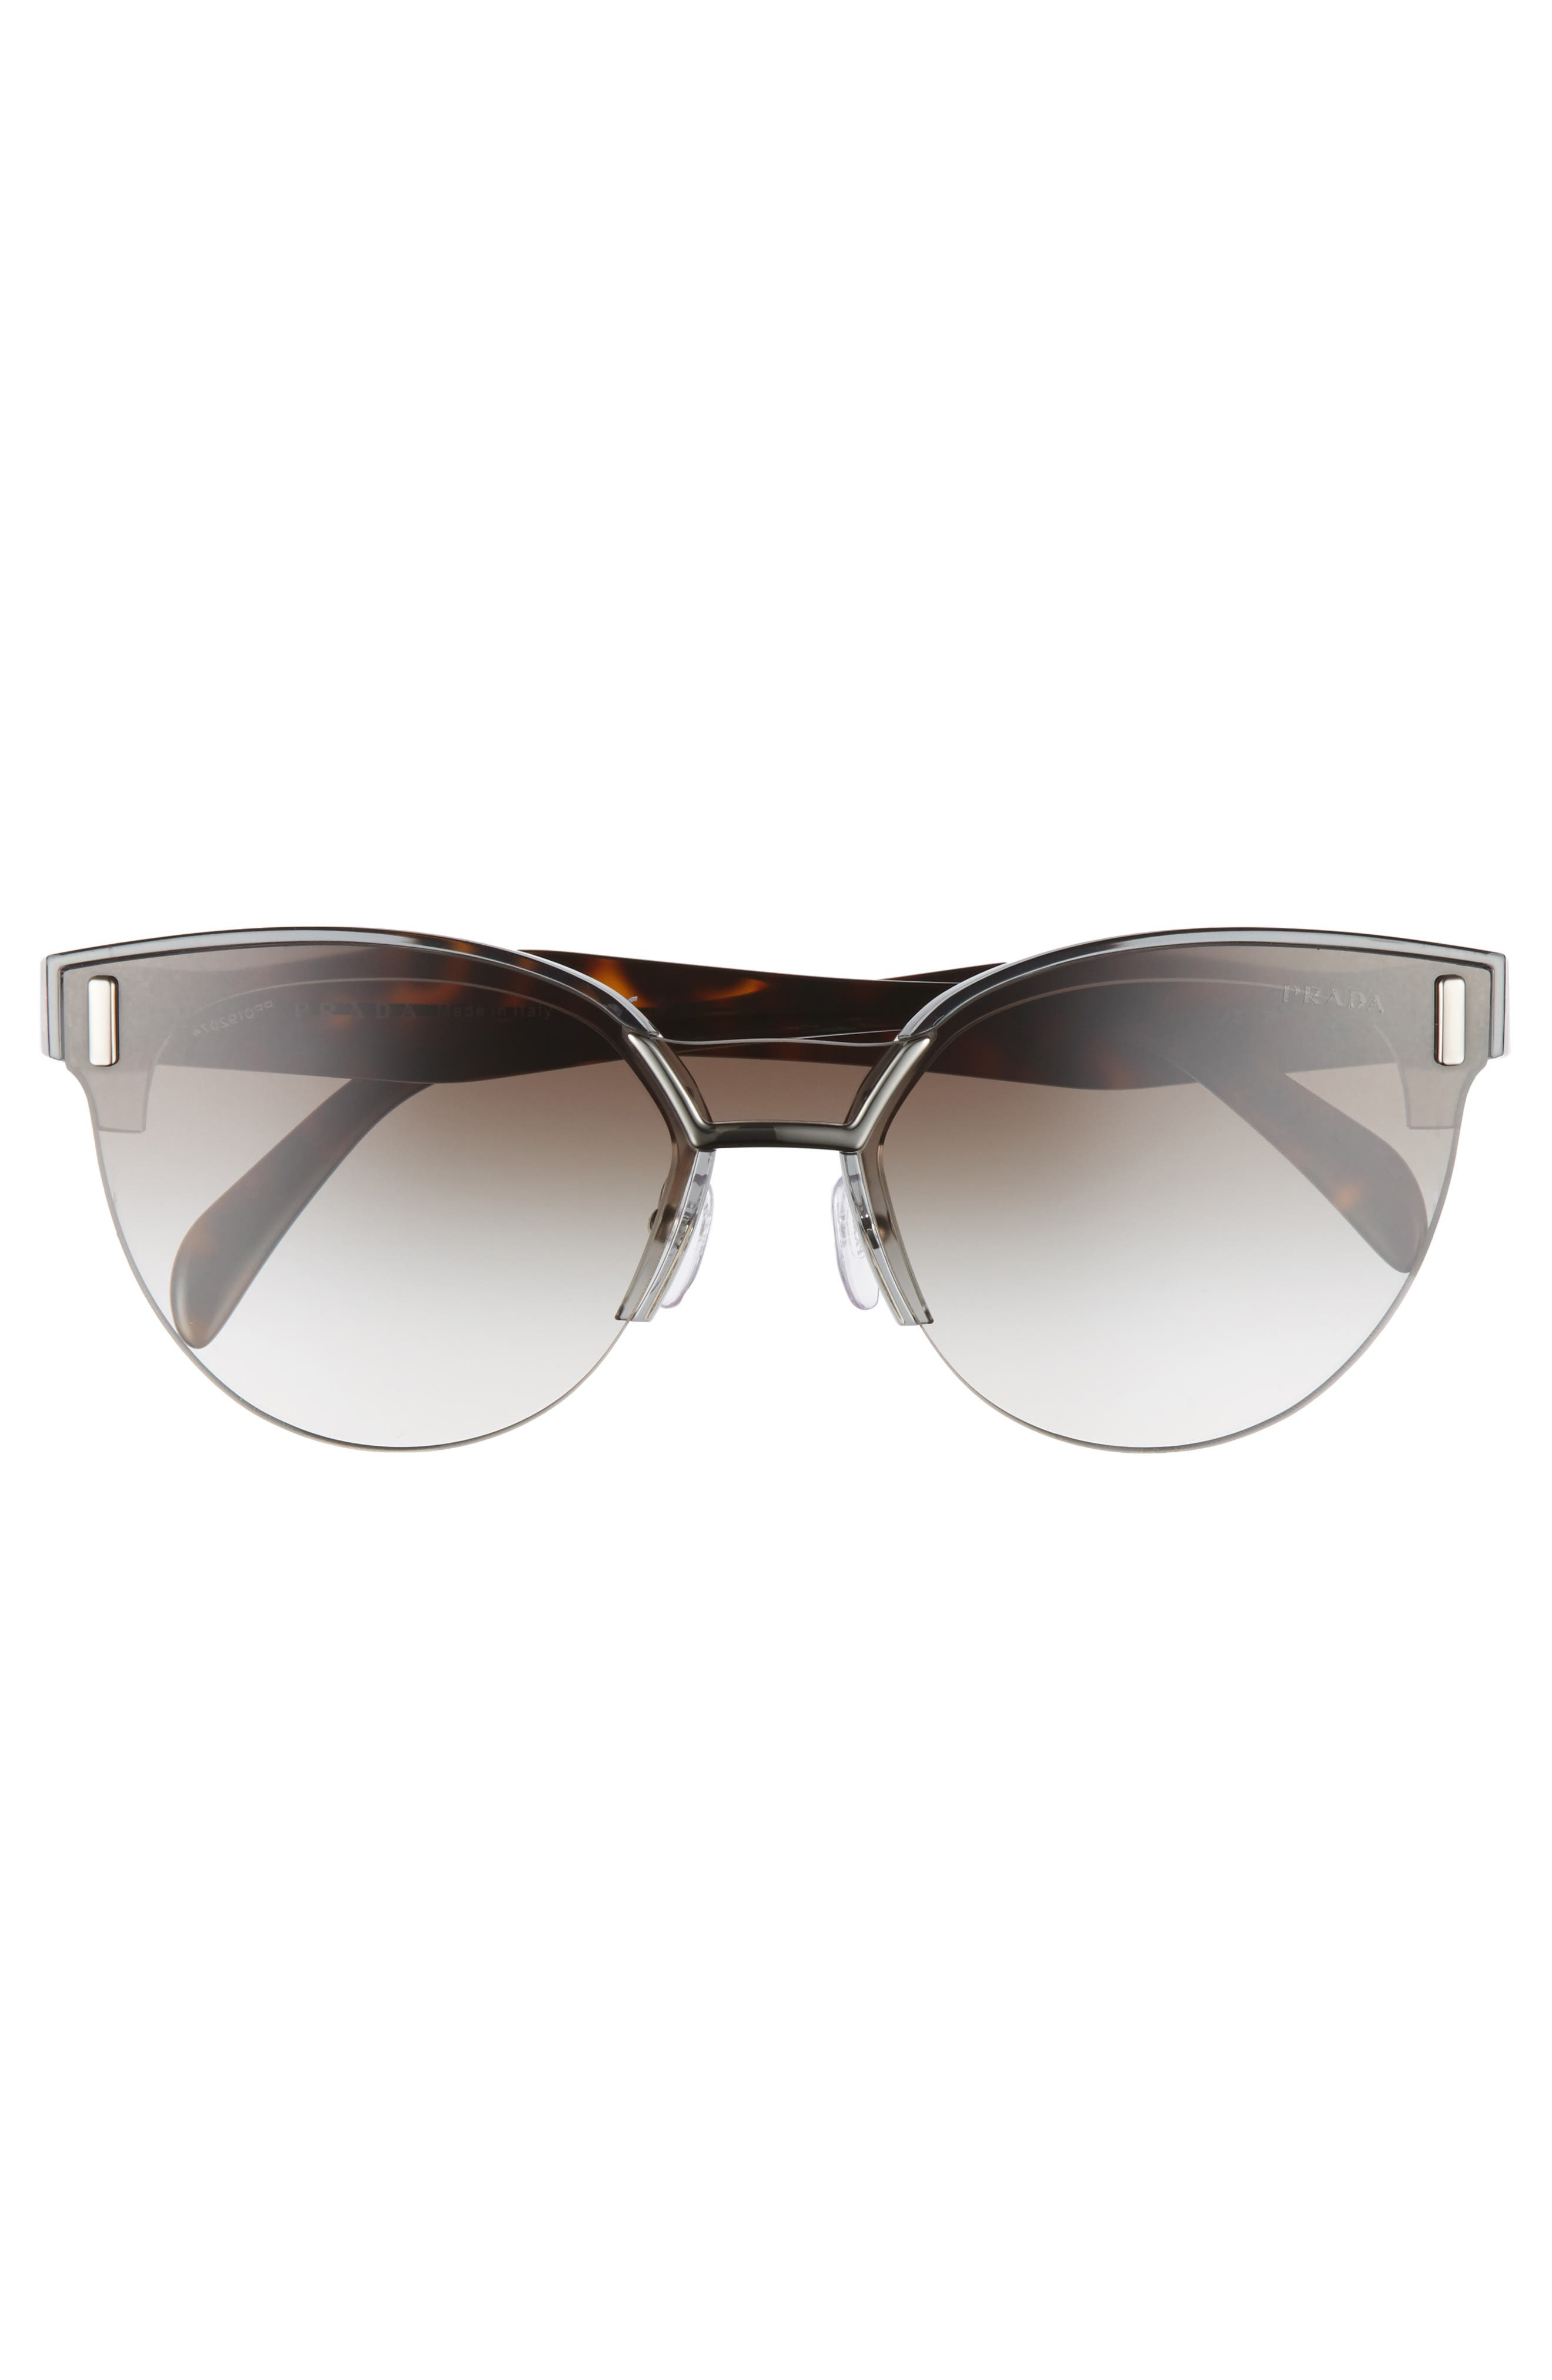 50mm Semi Rimless Gradient Sunglasses,                             Alternate thumbnail 4, color,                             025